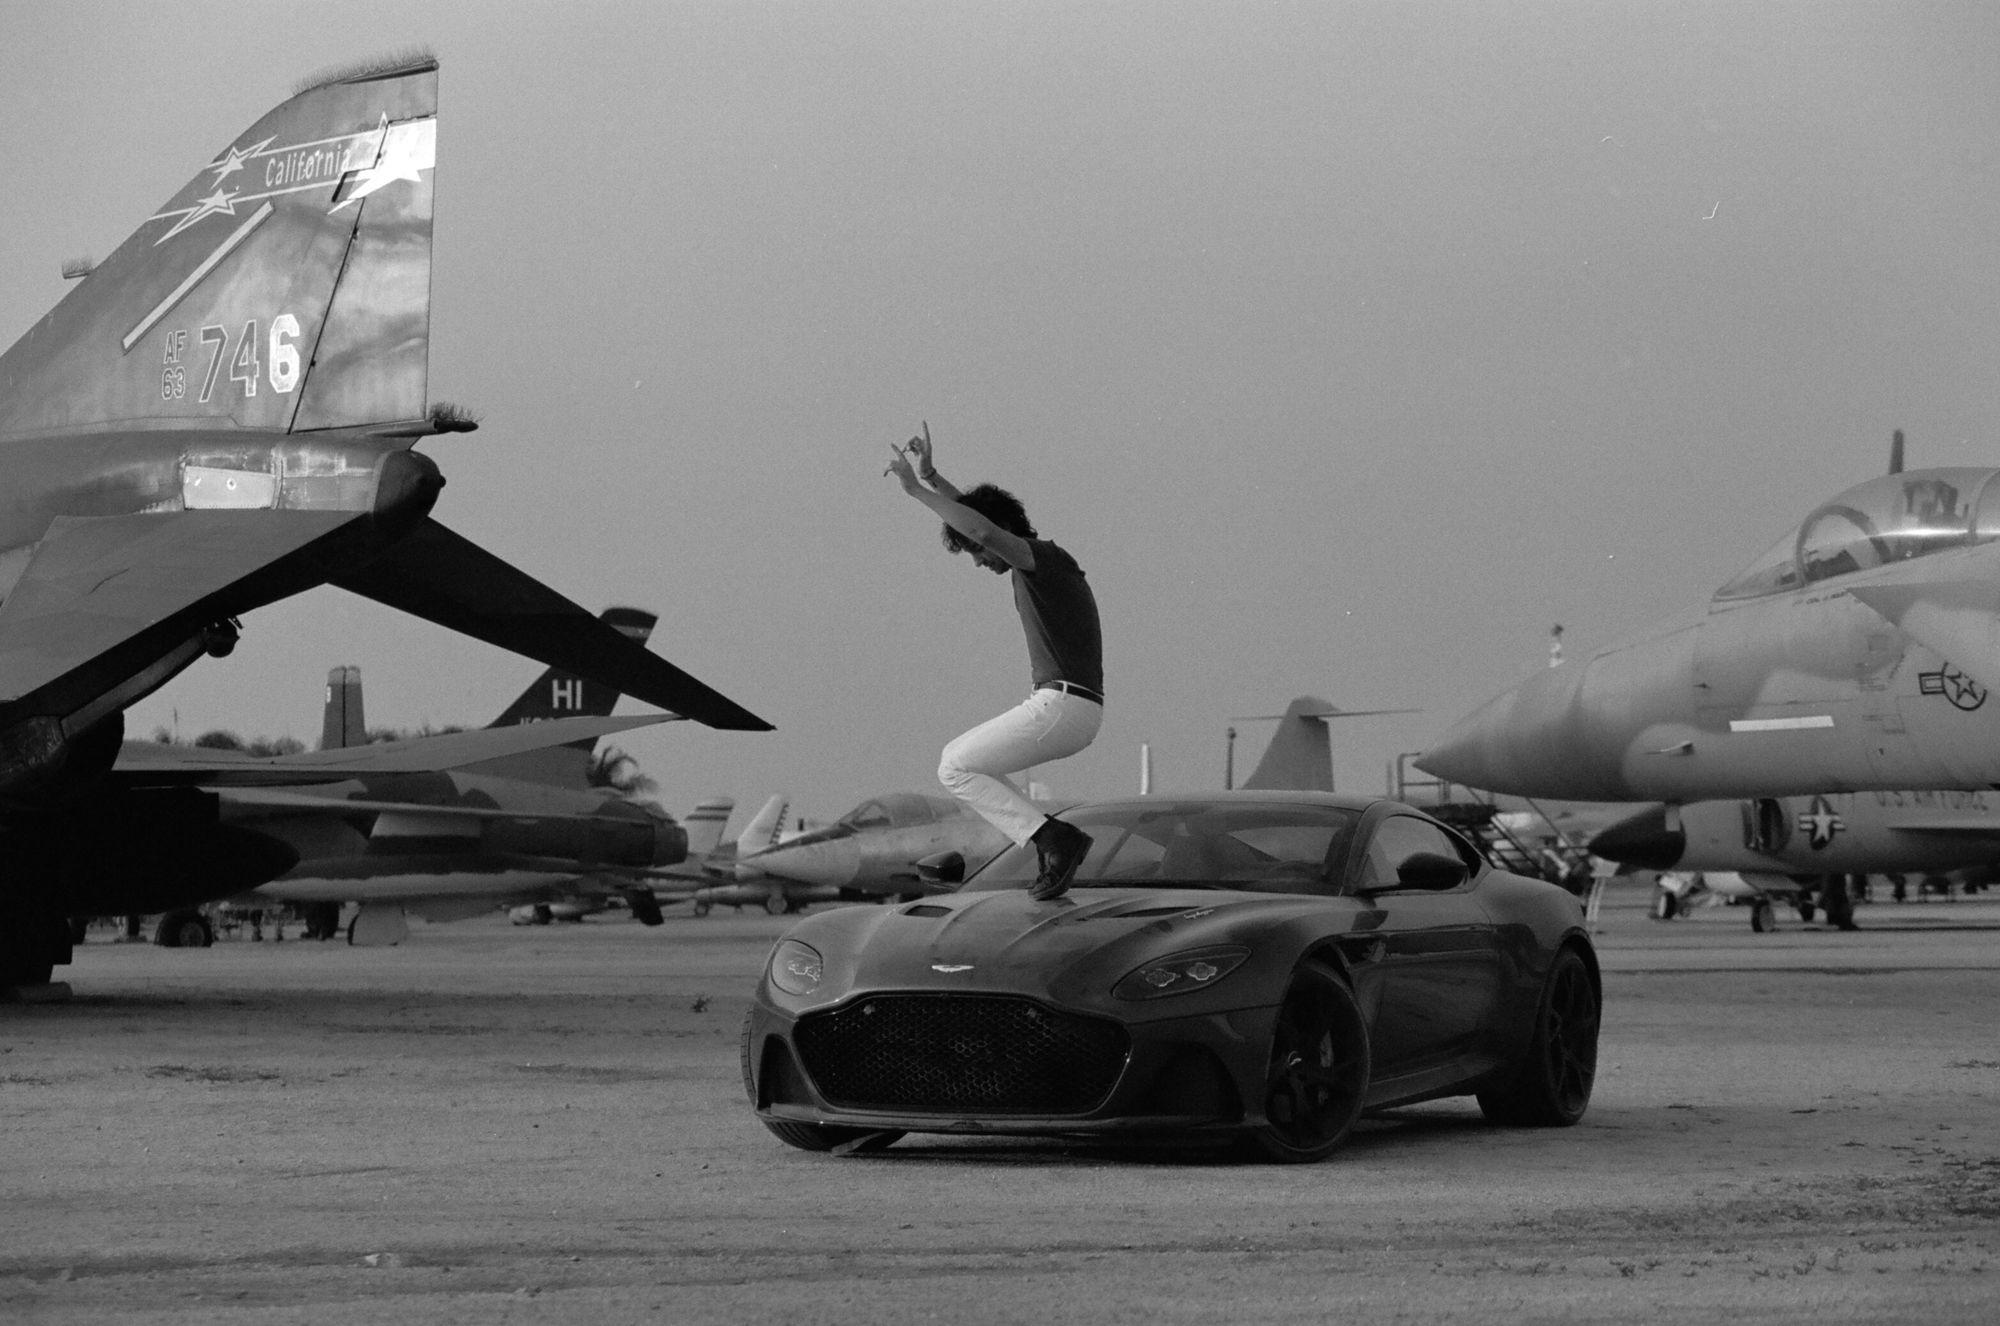 EMEIS DEUBEL: James Marcus Haney shoots Aston Martin DBS & Albert Hammond Jr. for The Road Rat